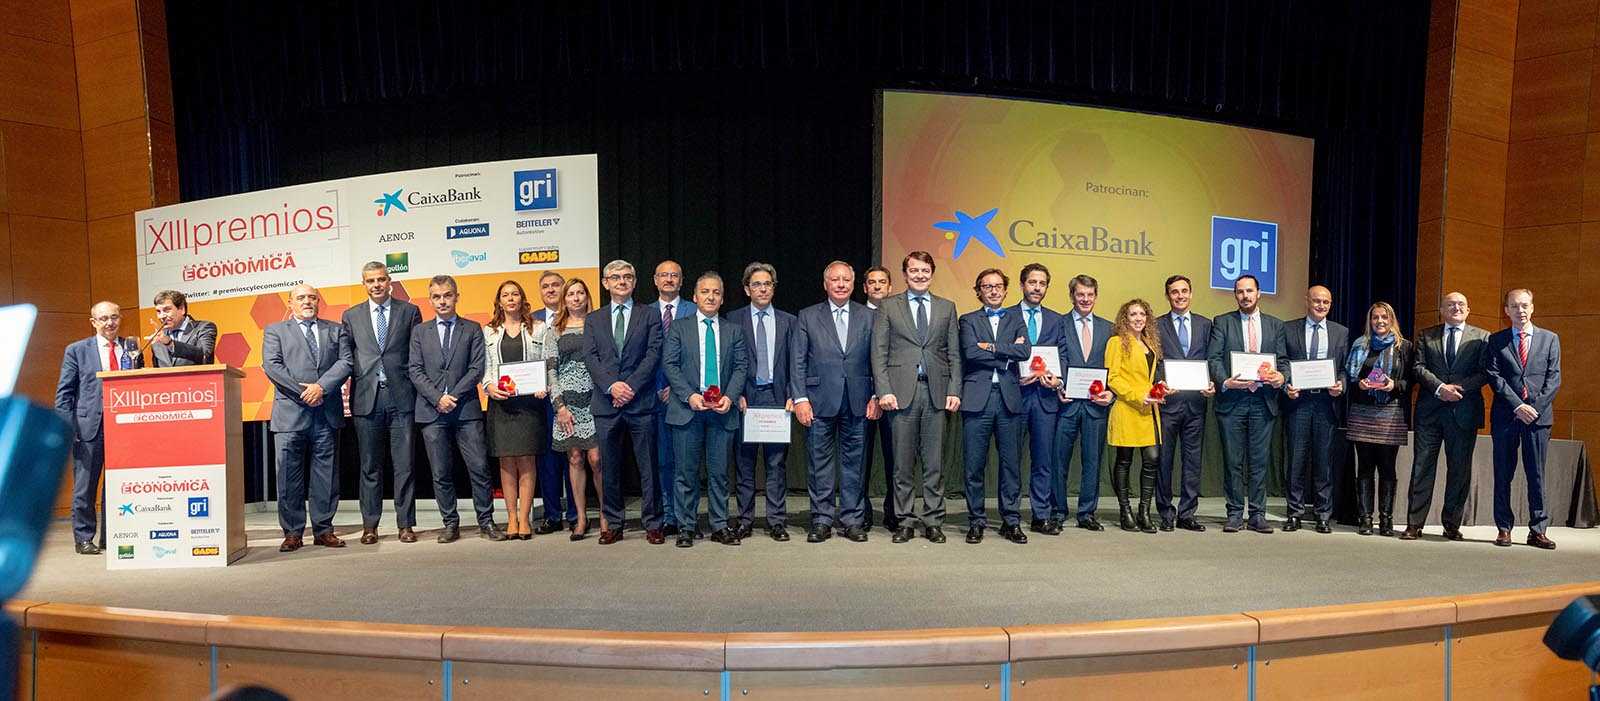 Foto de grupo XIII Premios CyLEconomica